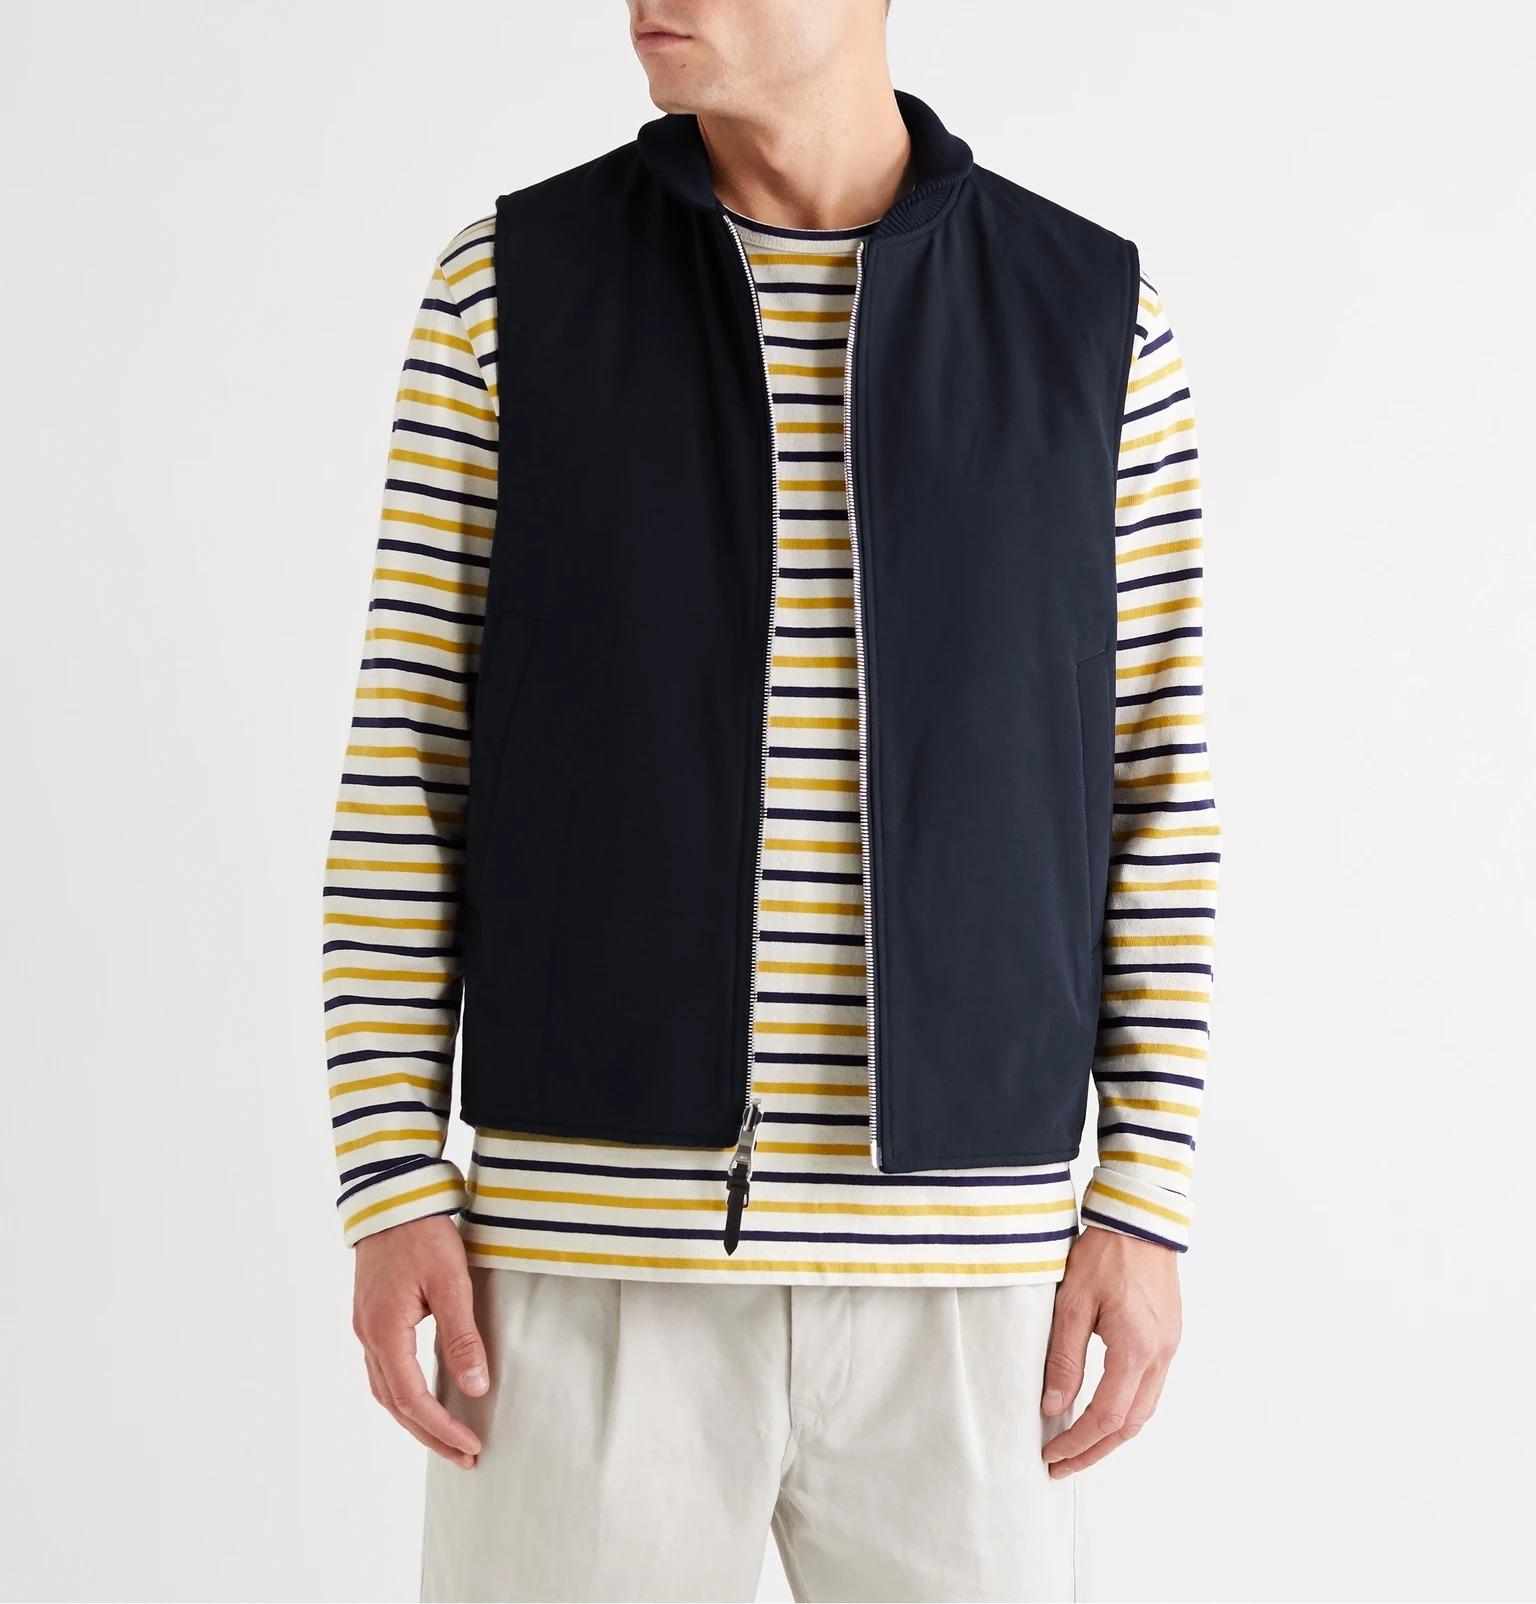 mr p black wool zippered vest